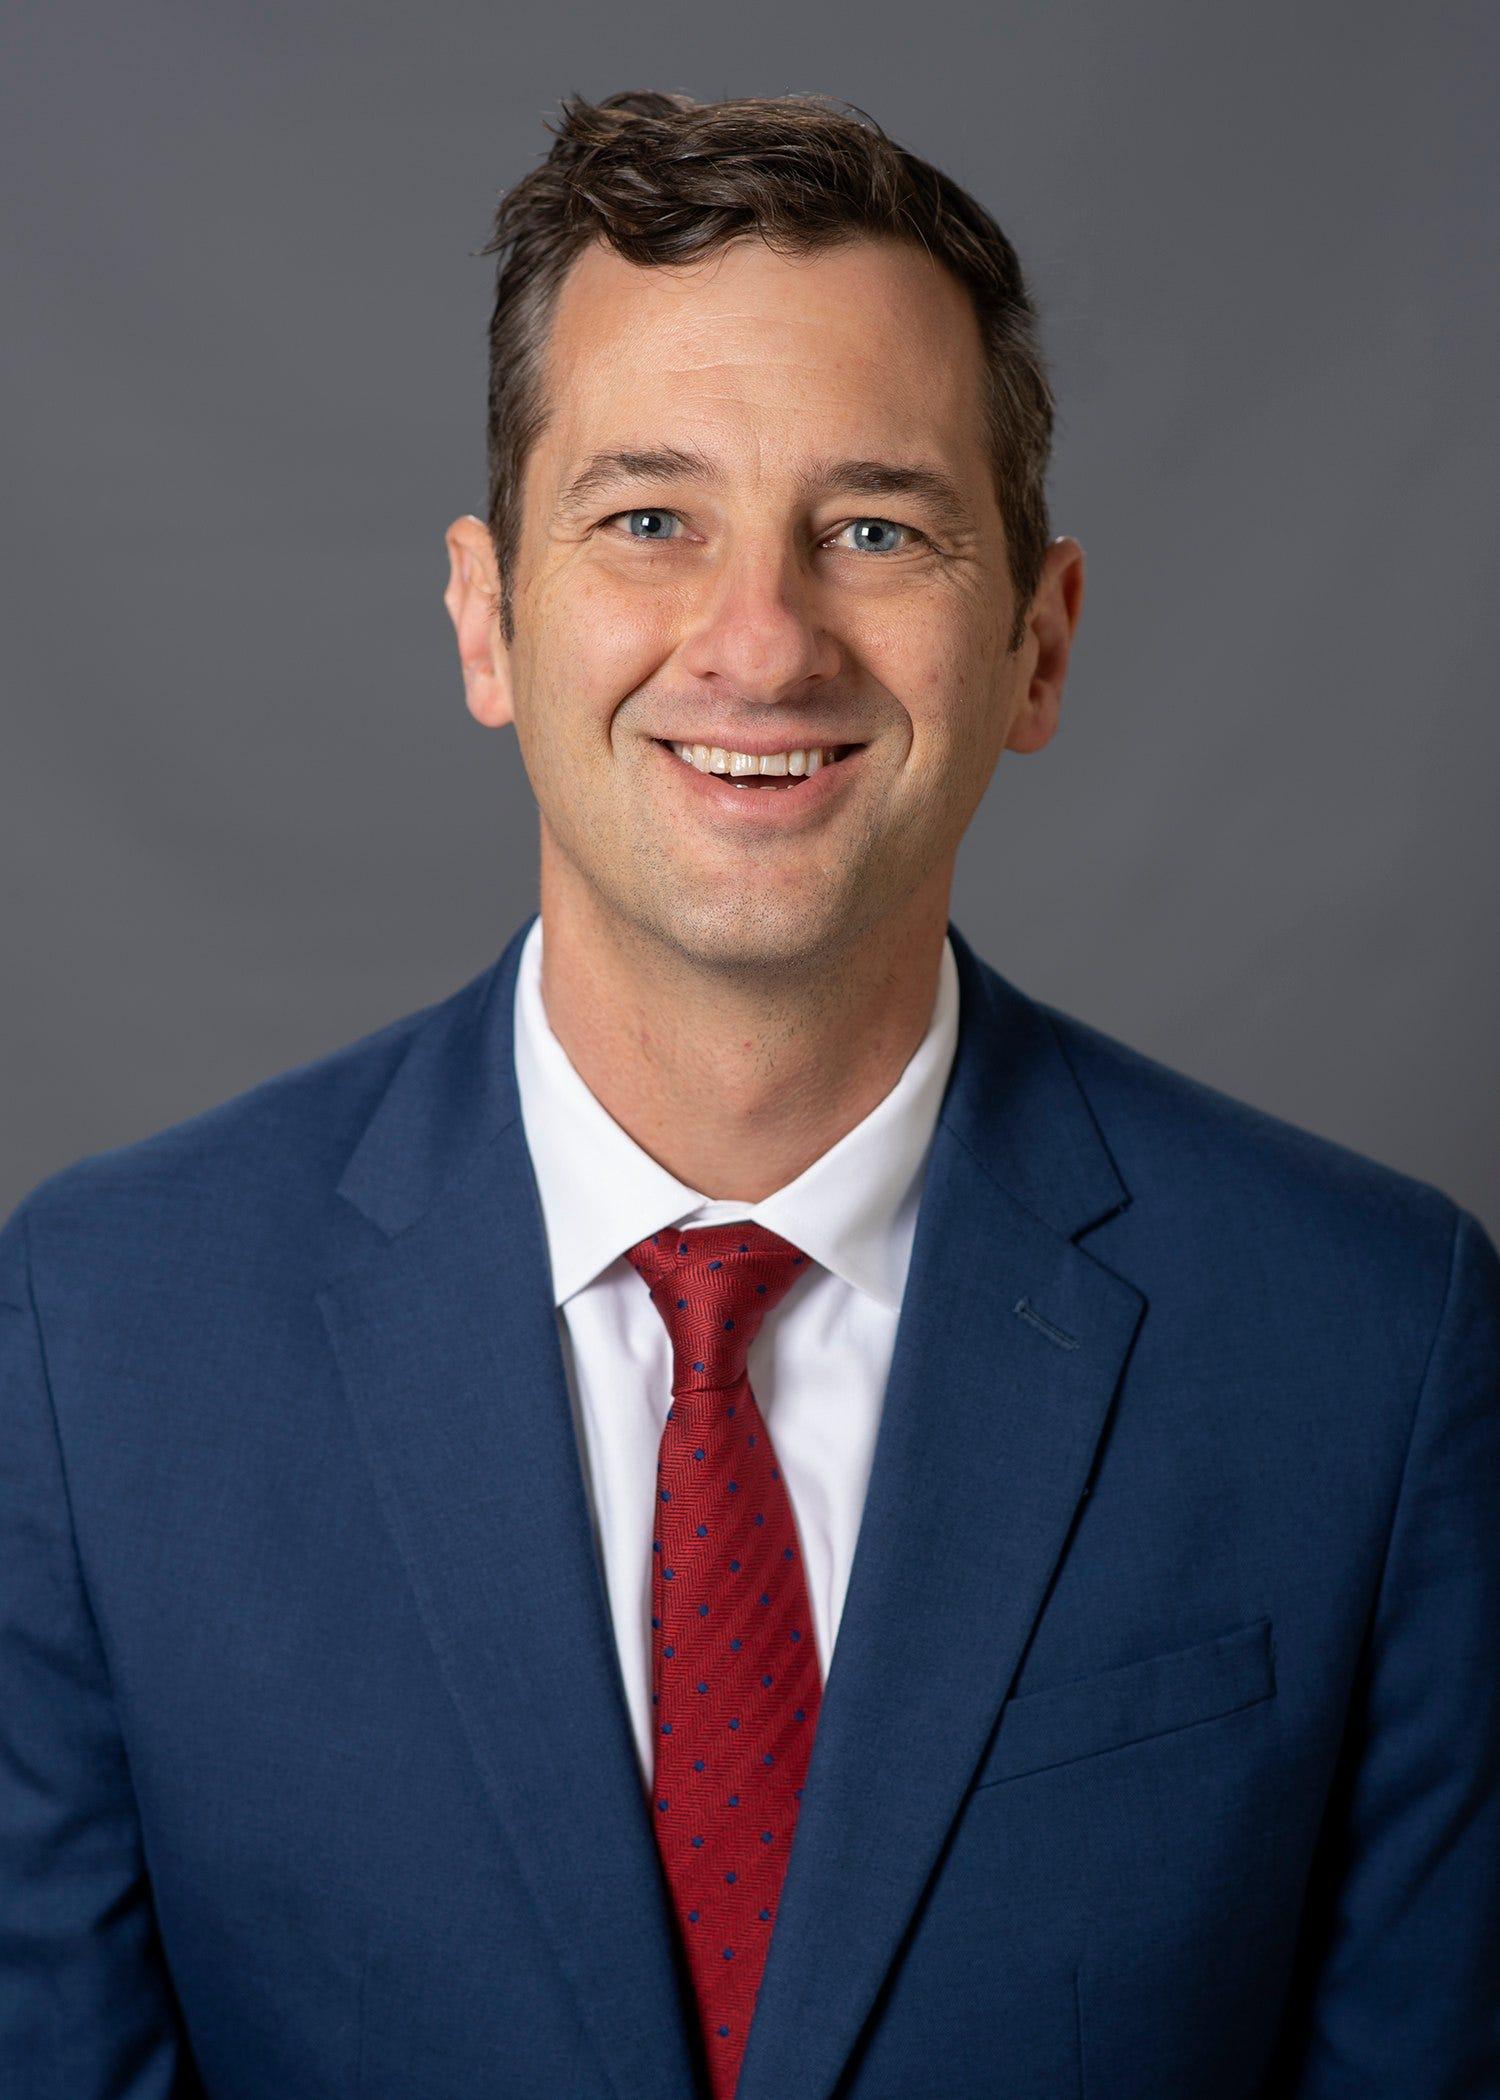 Political scientist Chris Cooper of Western Carolina University.